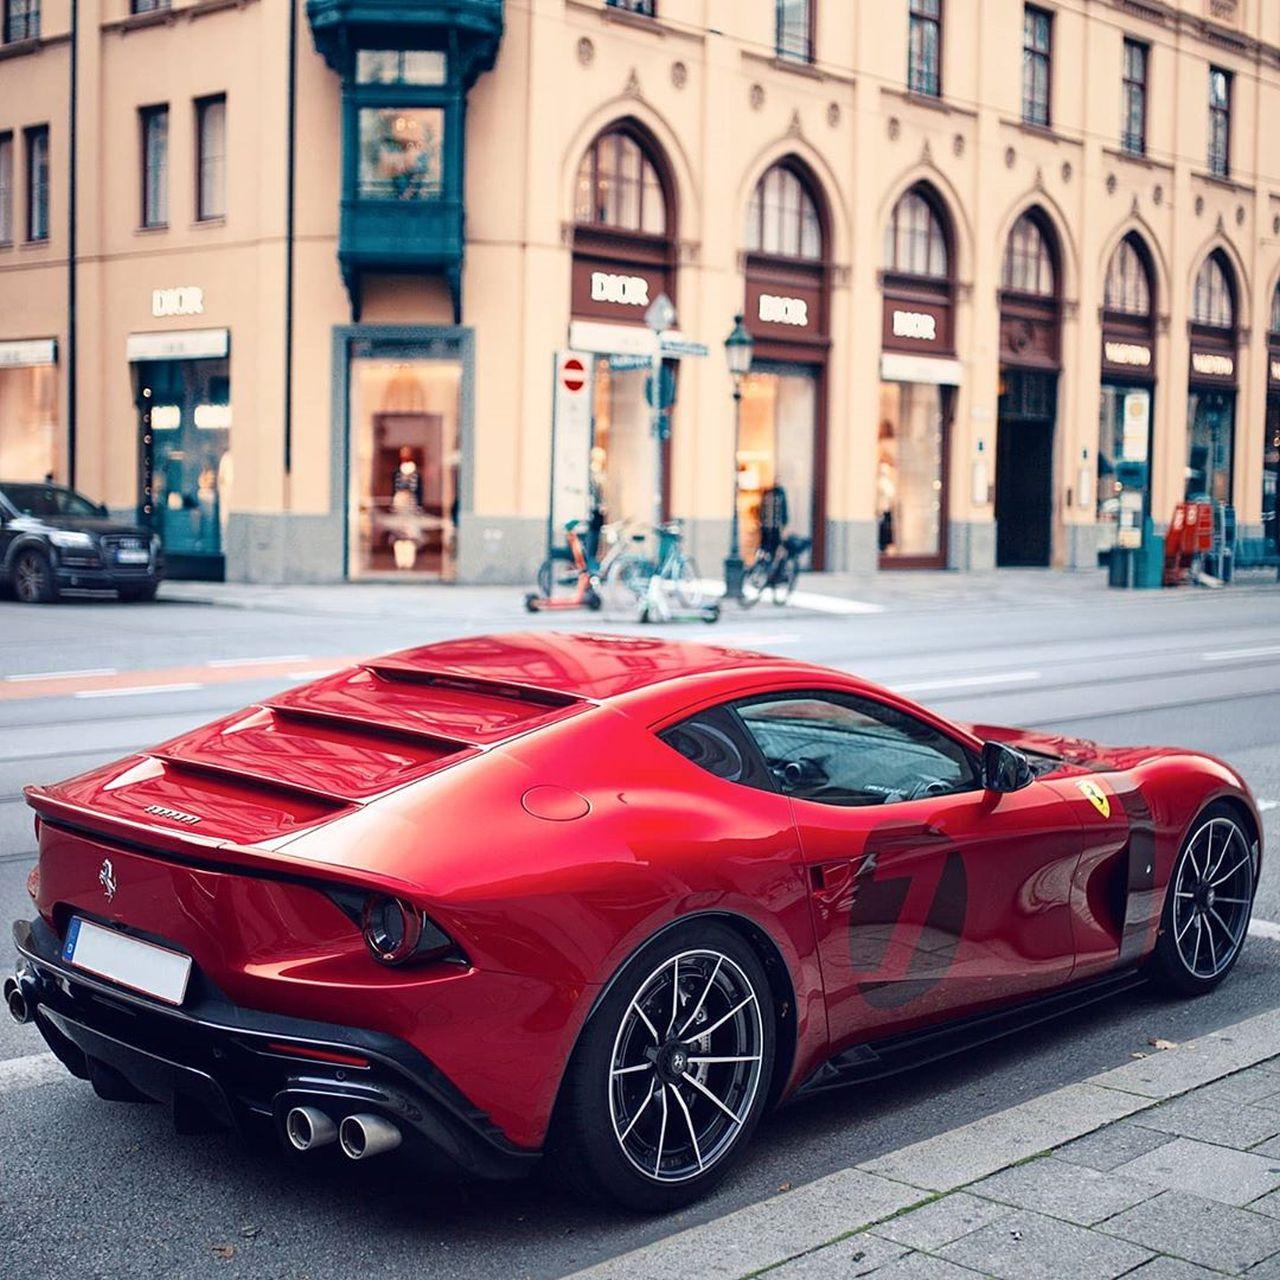 One Off Ferrari Omologata Spotted In Munich The Supercar Blog